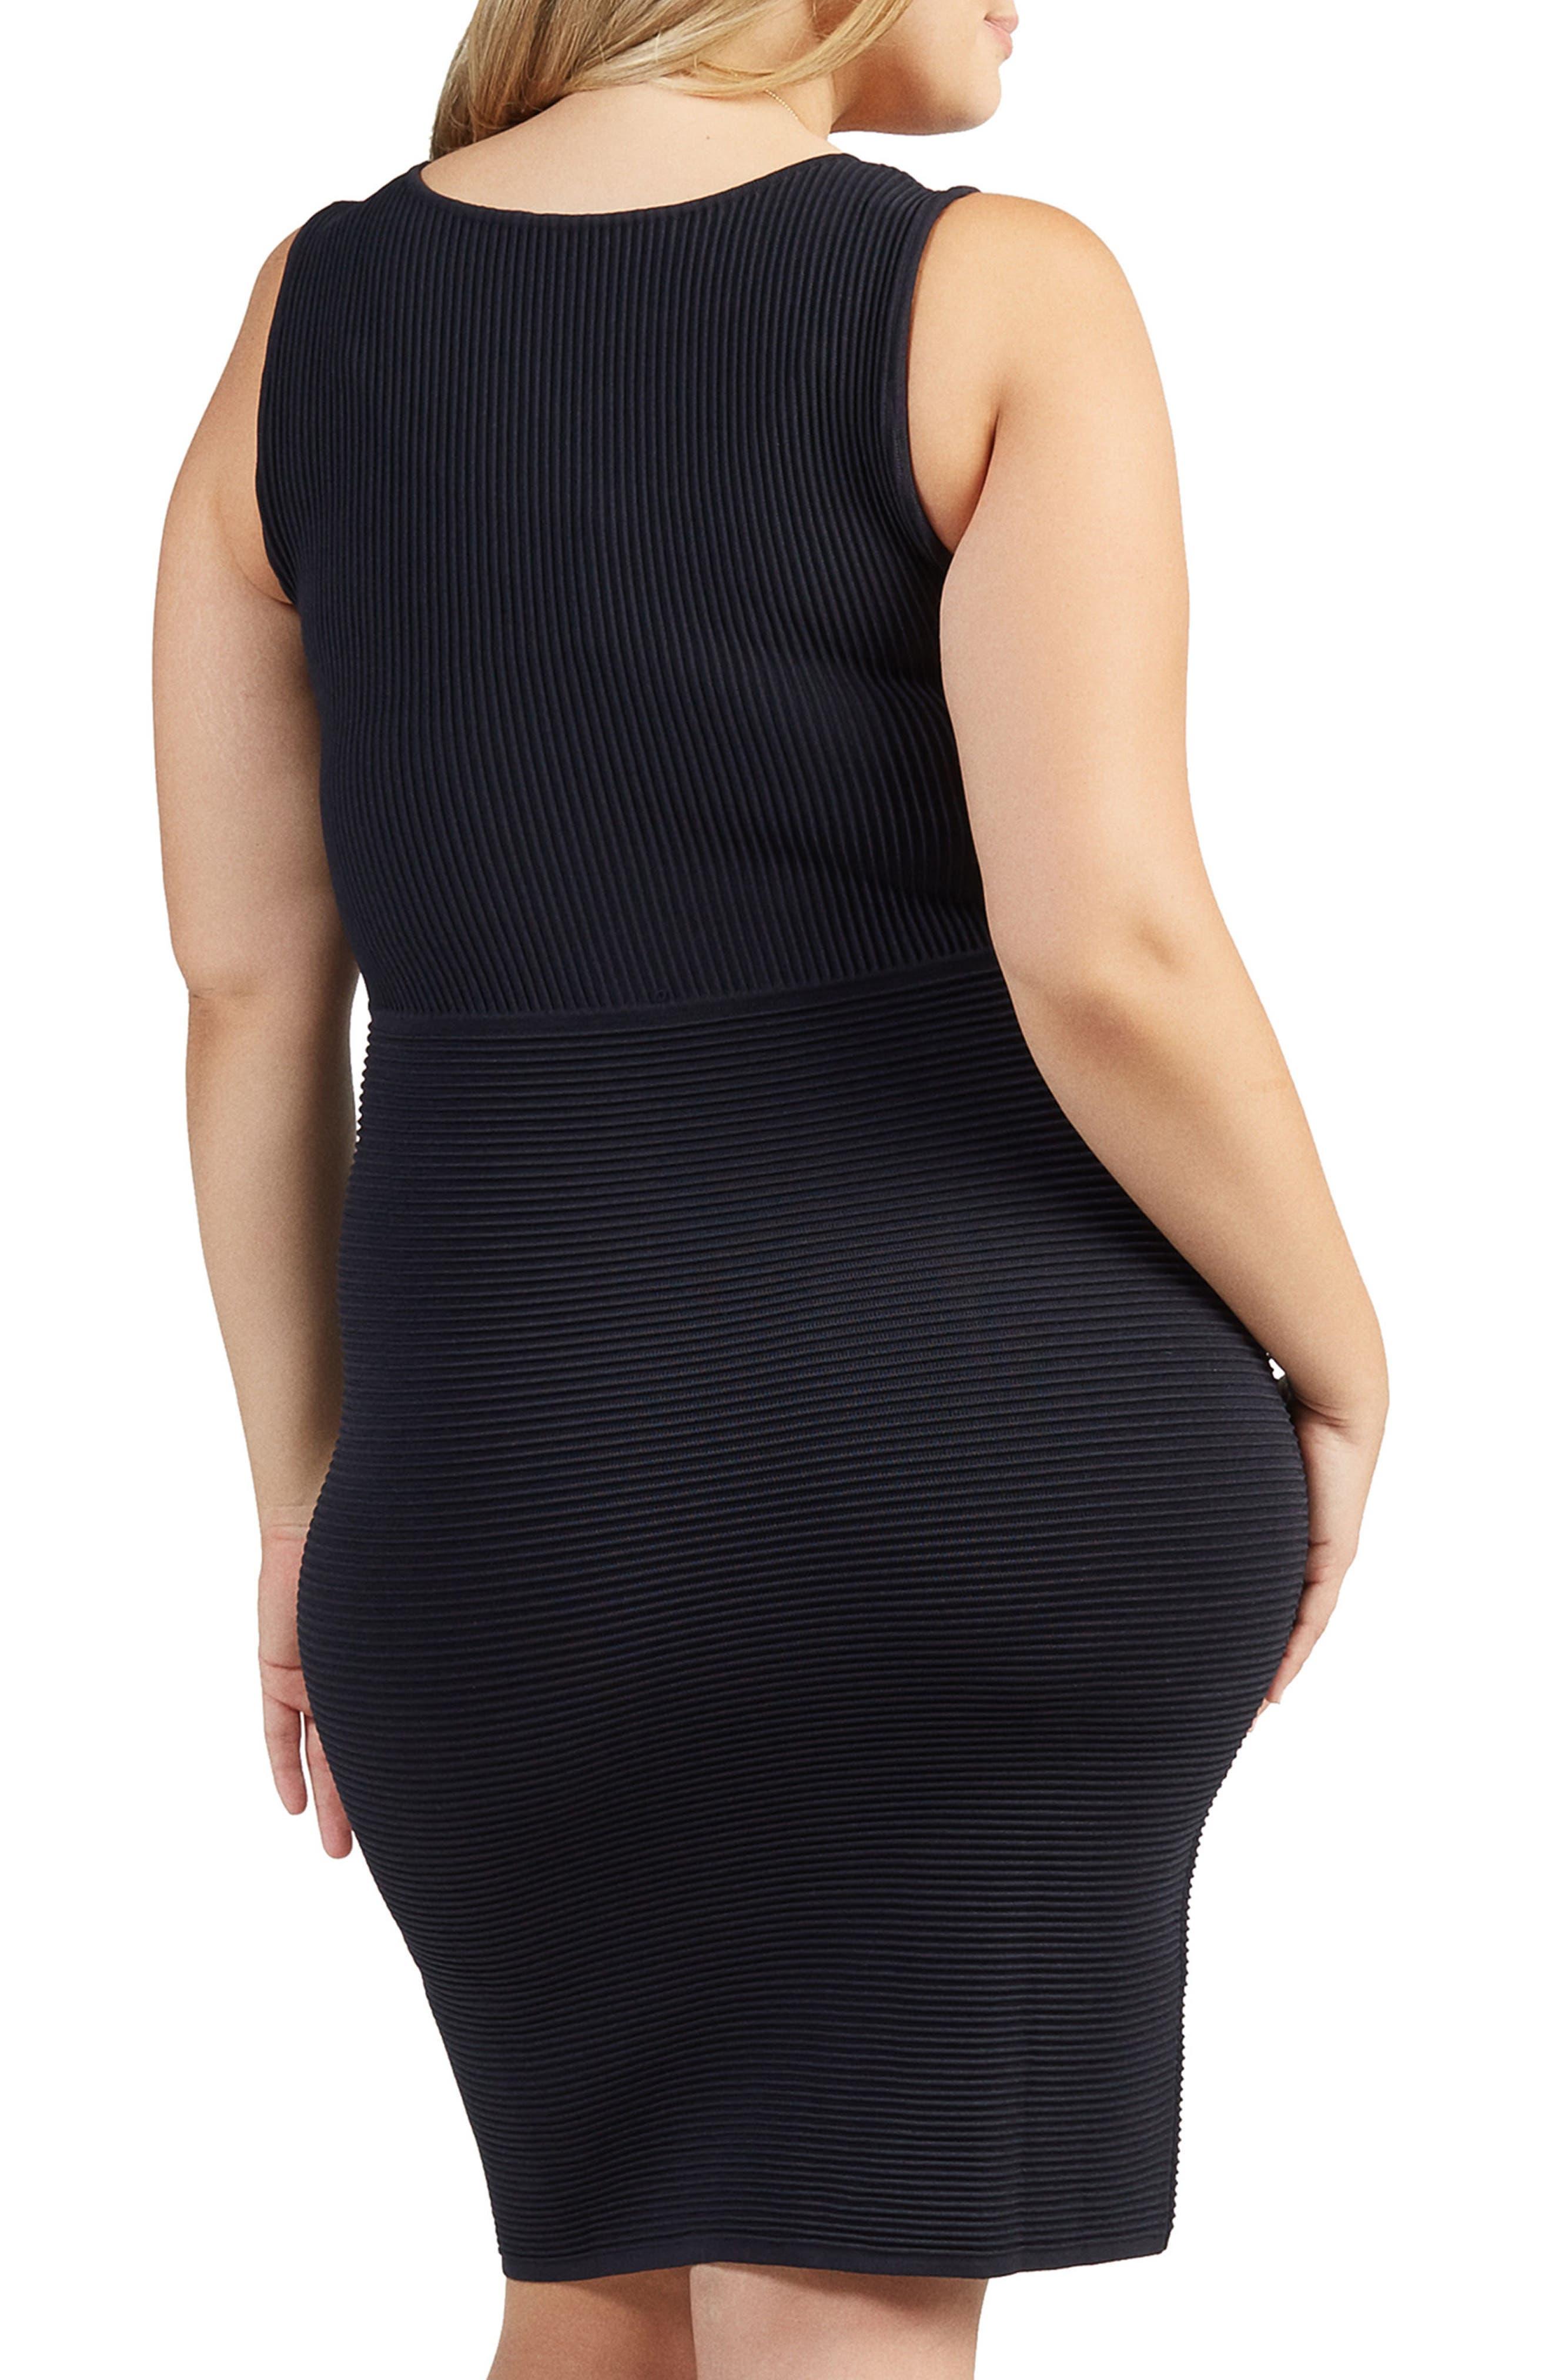 Alternate Image 2  - Tart Beri Rib Knit Body-Con Dress (Plus Size)